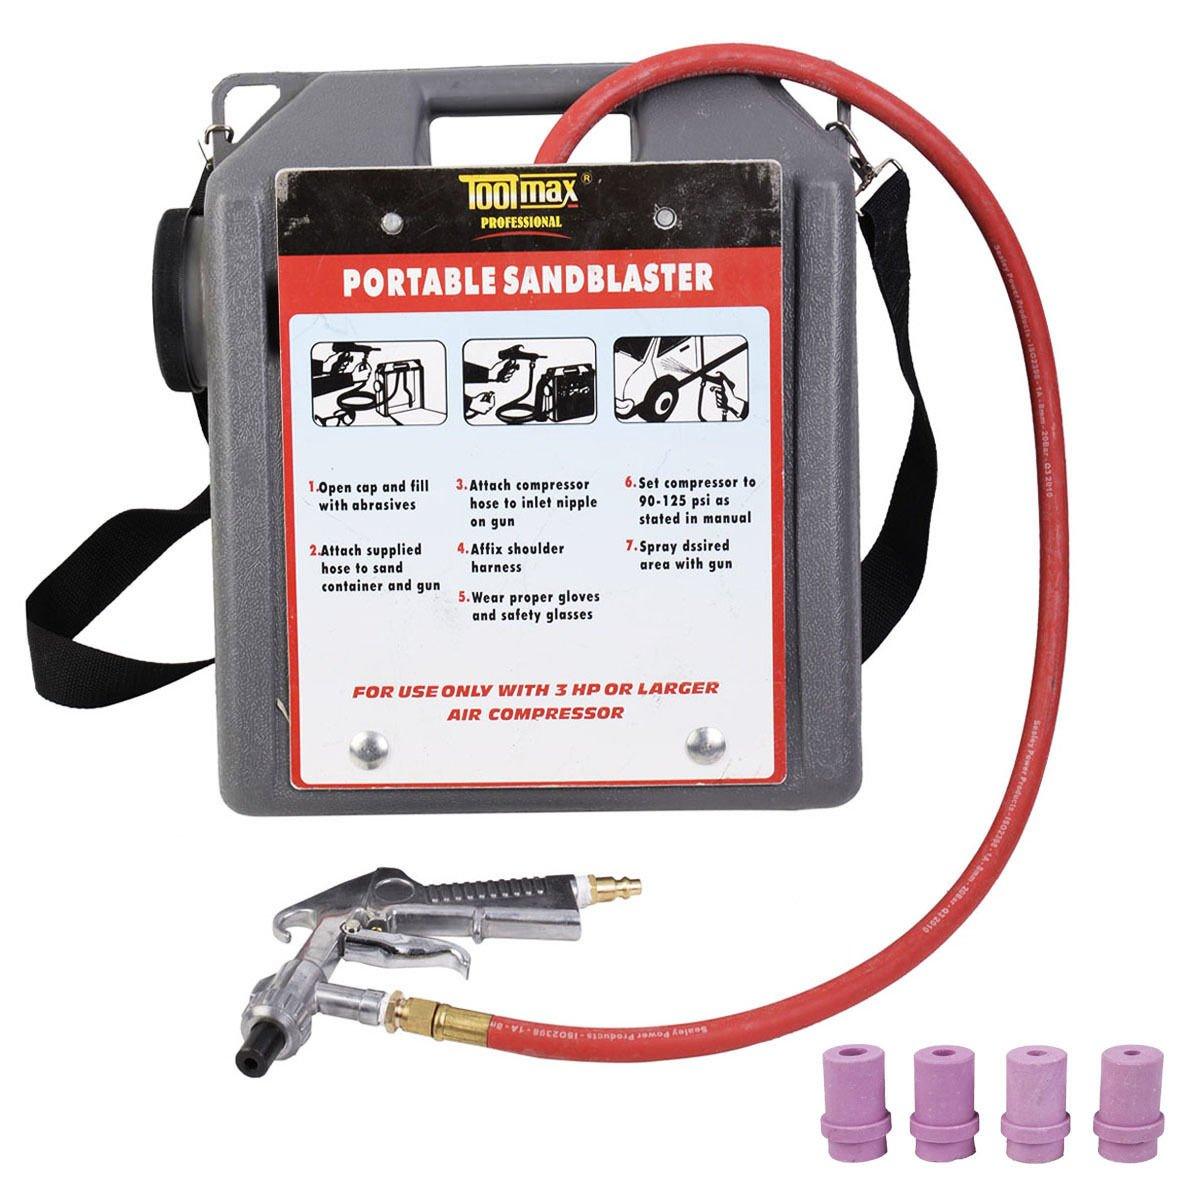 30 lbs Portable Handheld Air Sandblaster kit Tools Blasting Gun Hose w/4 Nozzles